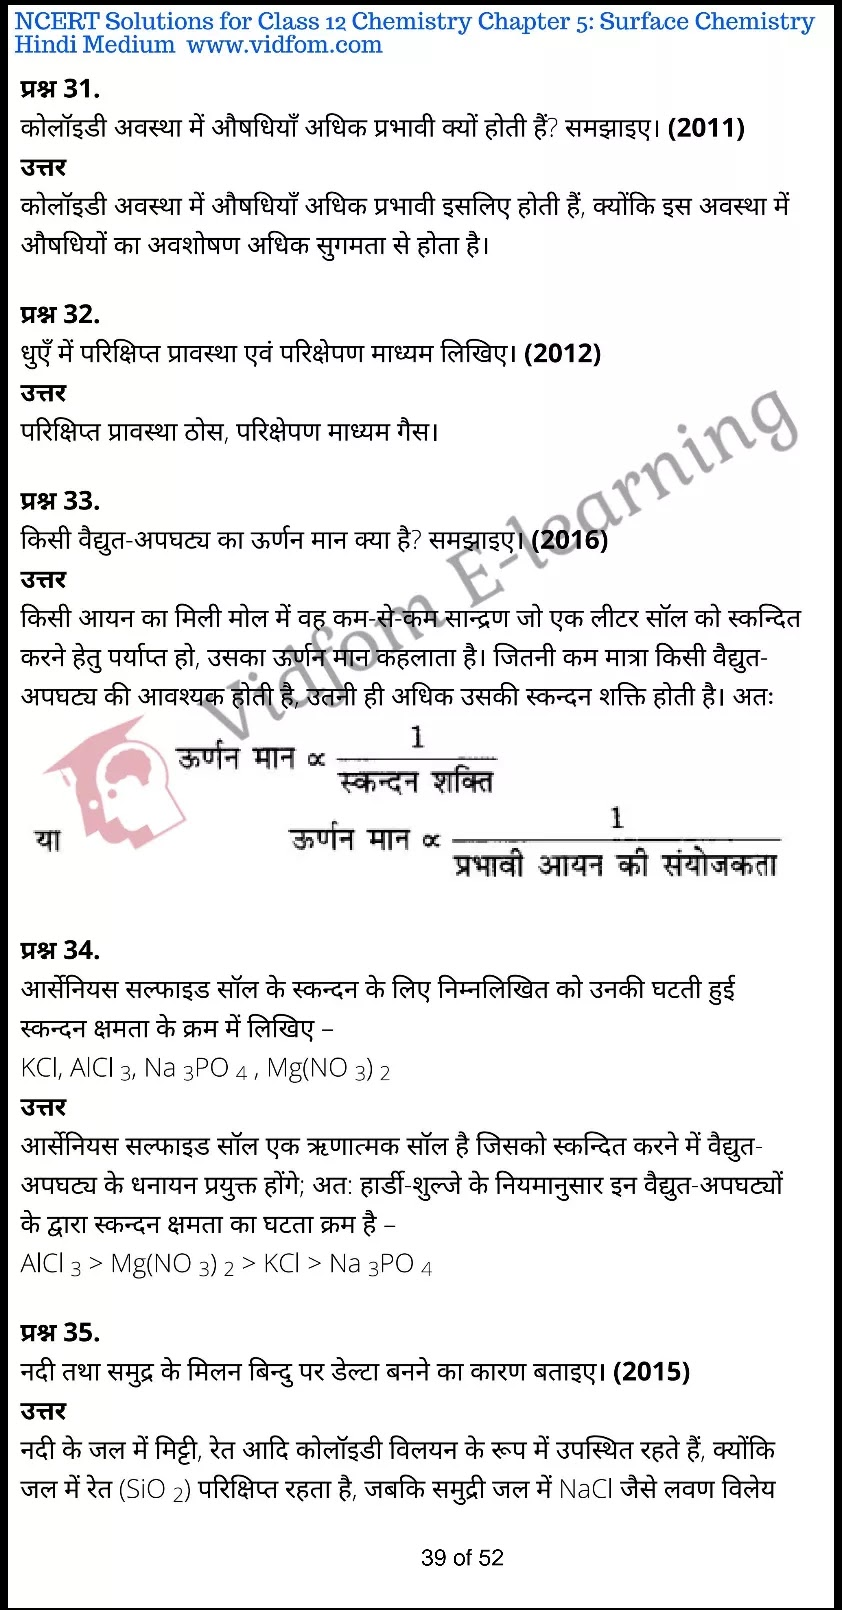 class 12 chemistry chapter 5 light hindi medium 39